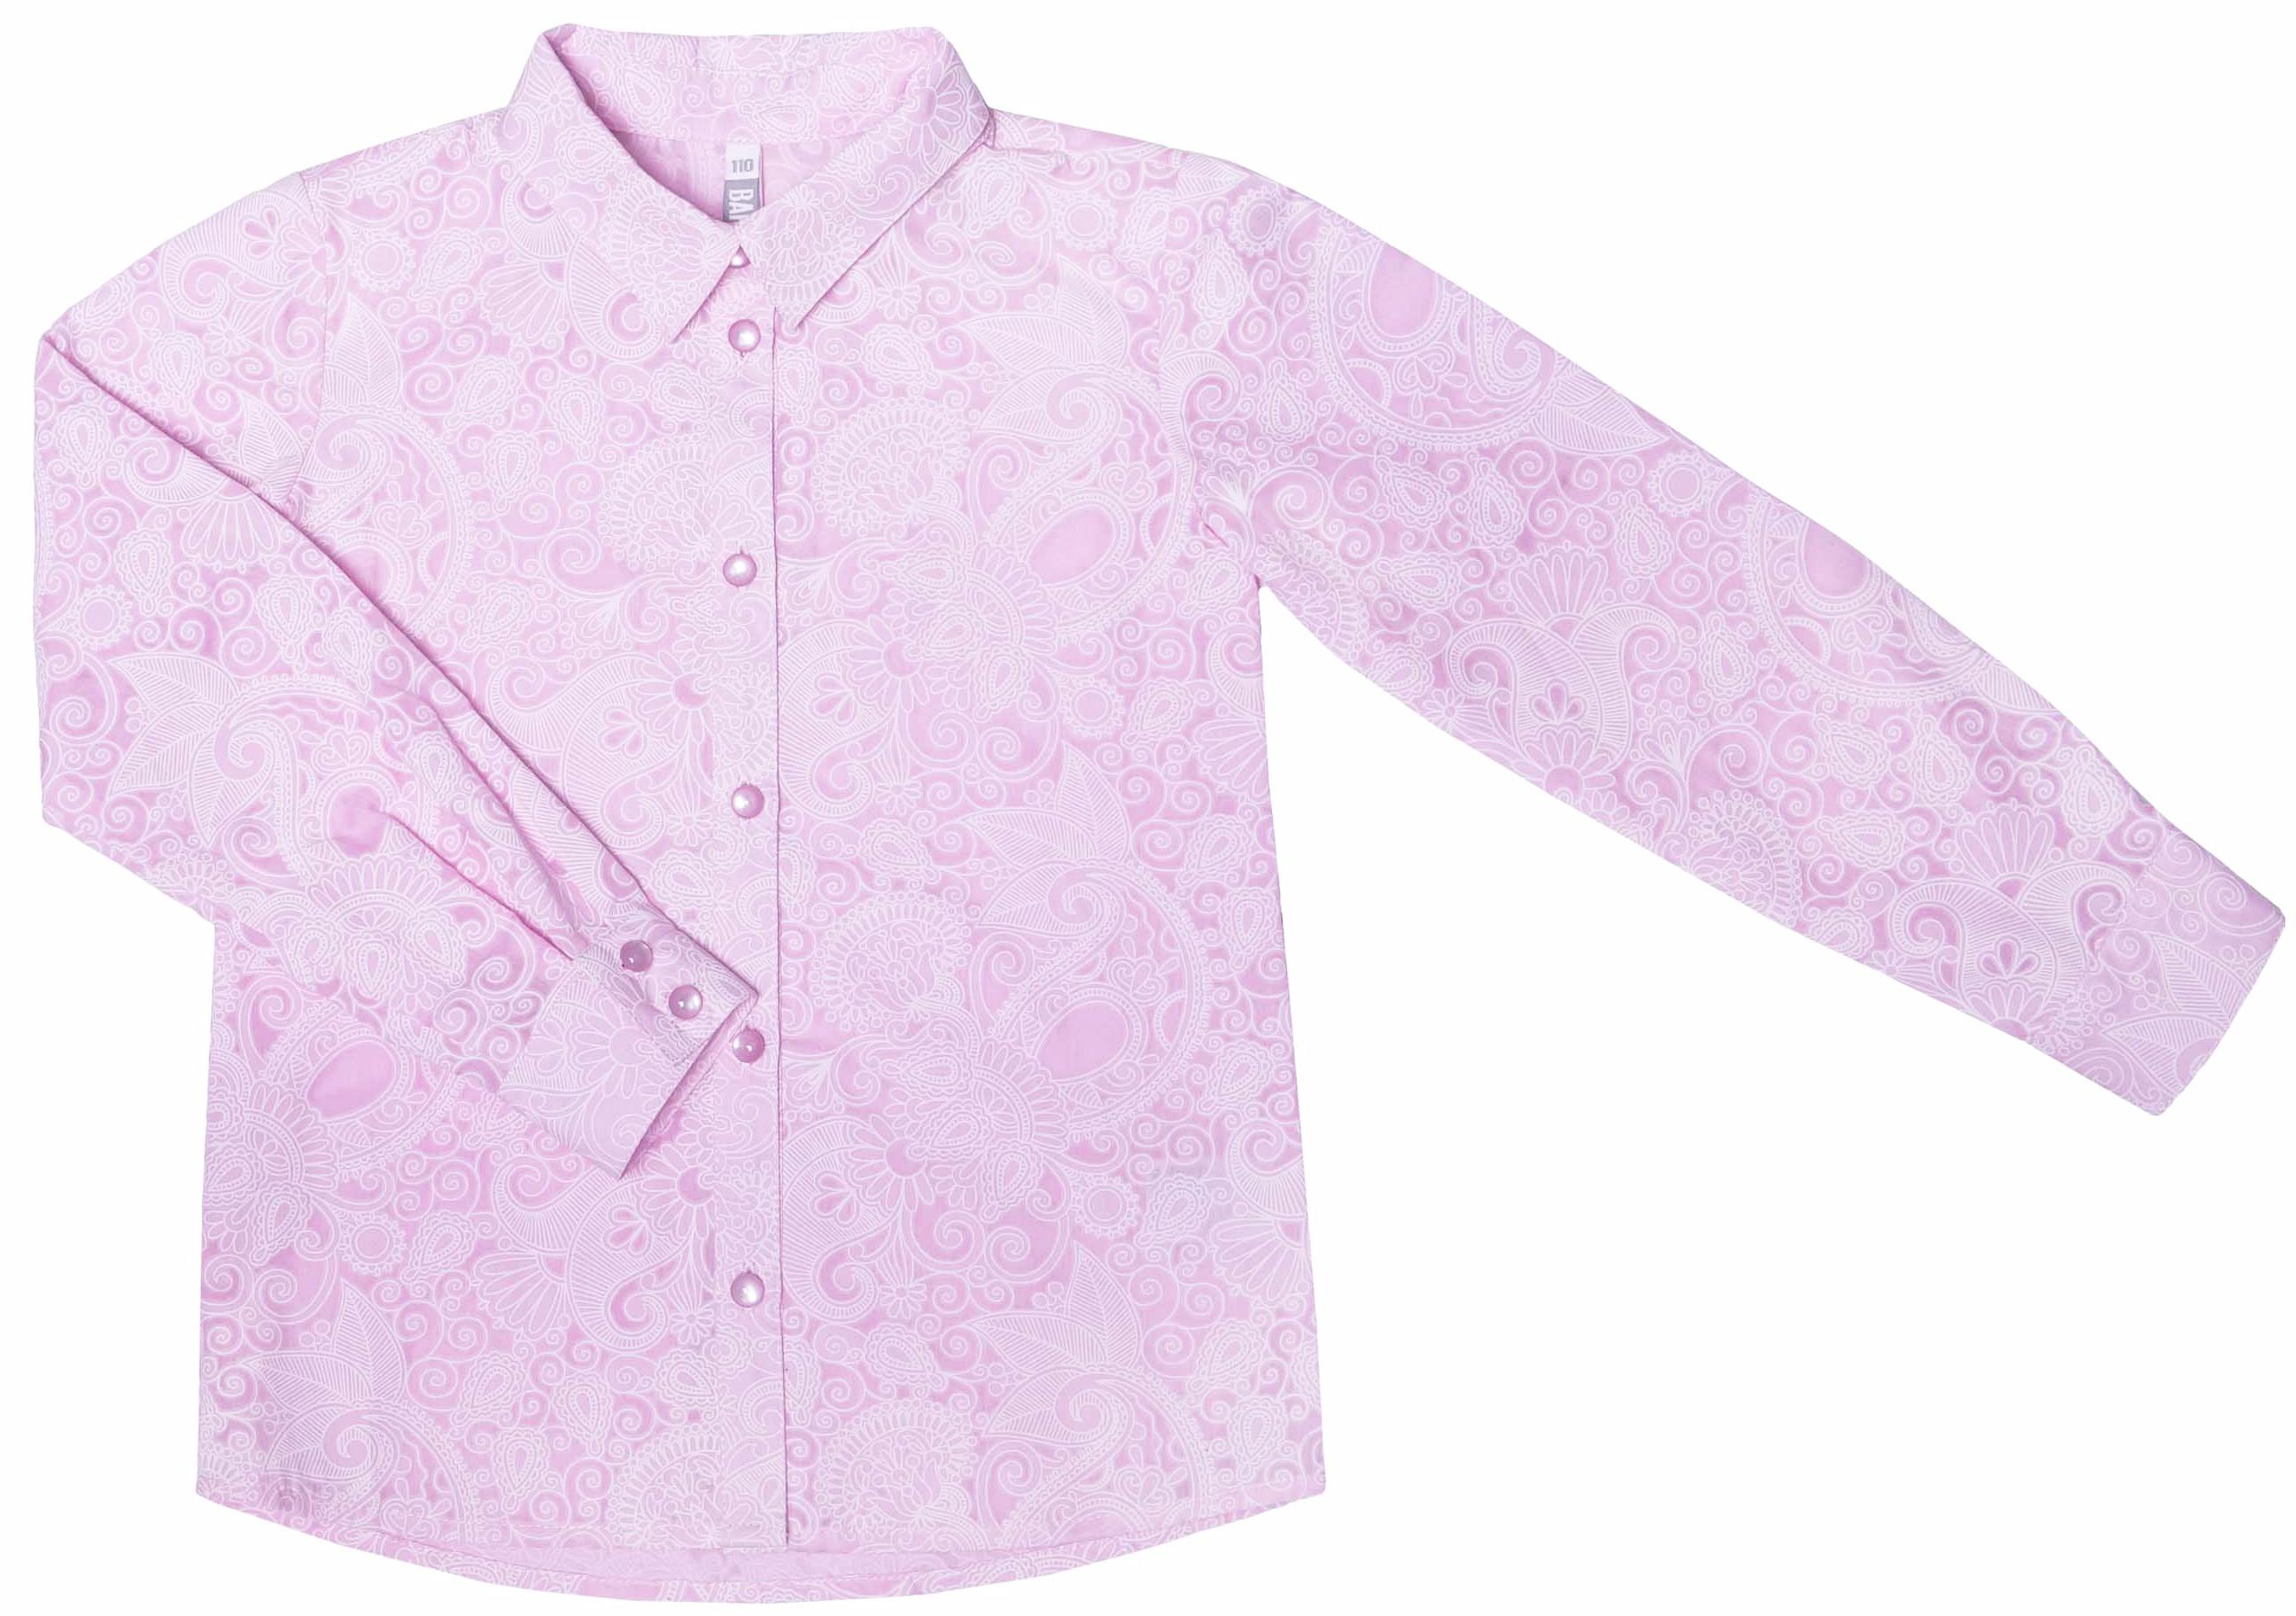 Блузка Barkito Осень розовая